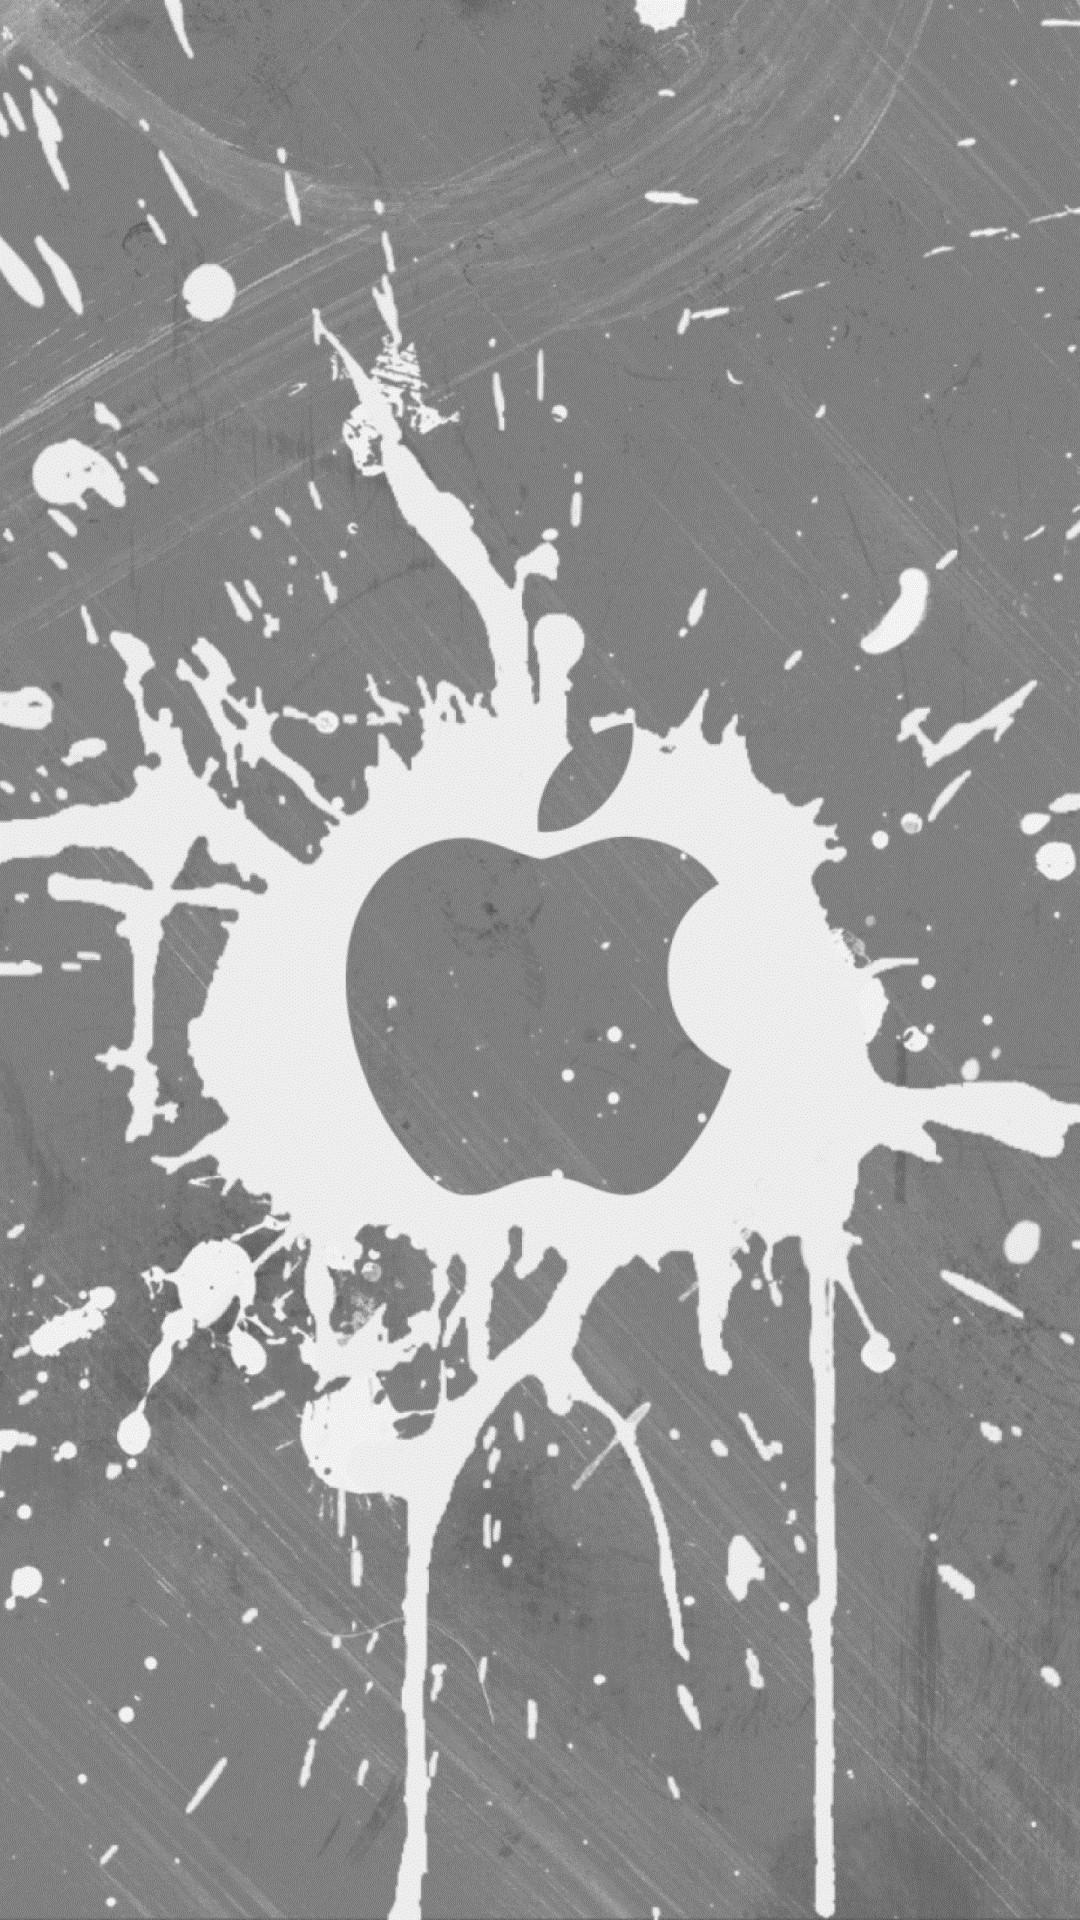 Grunge phone wallpaper